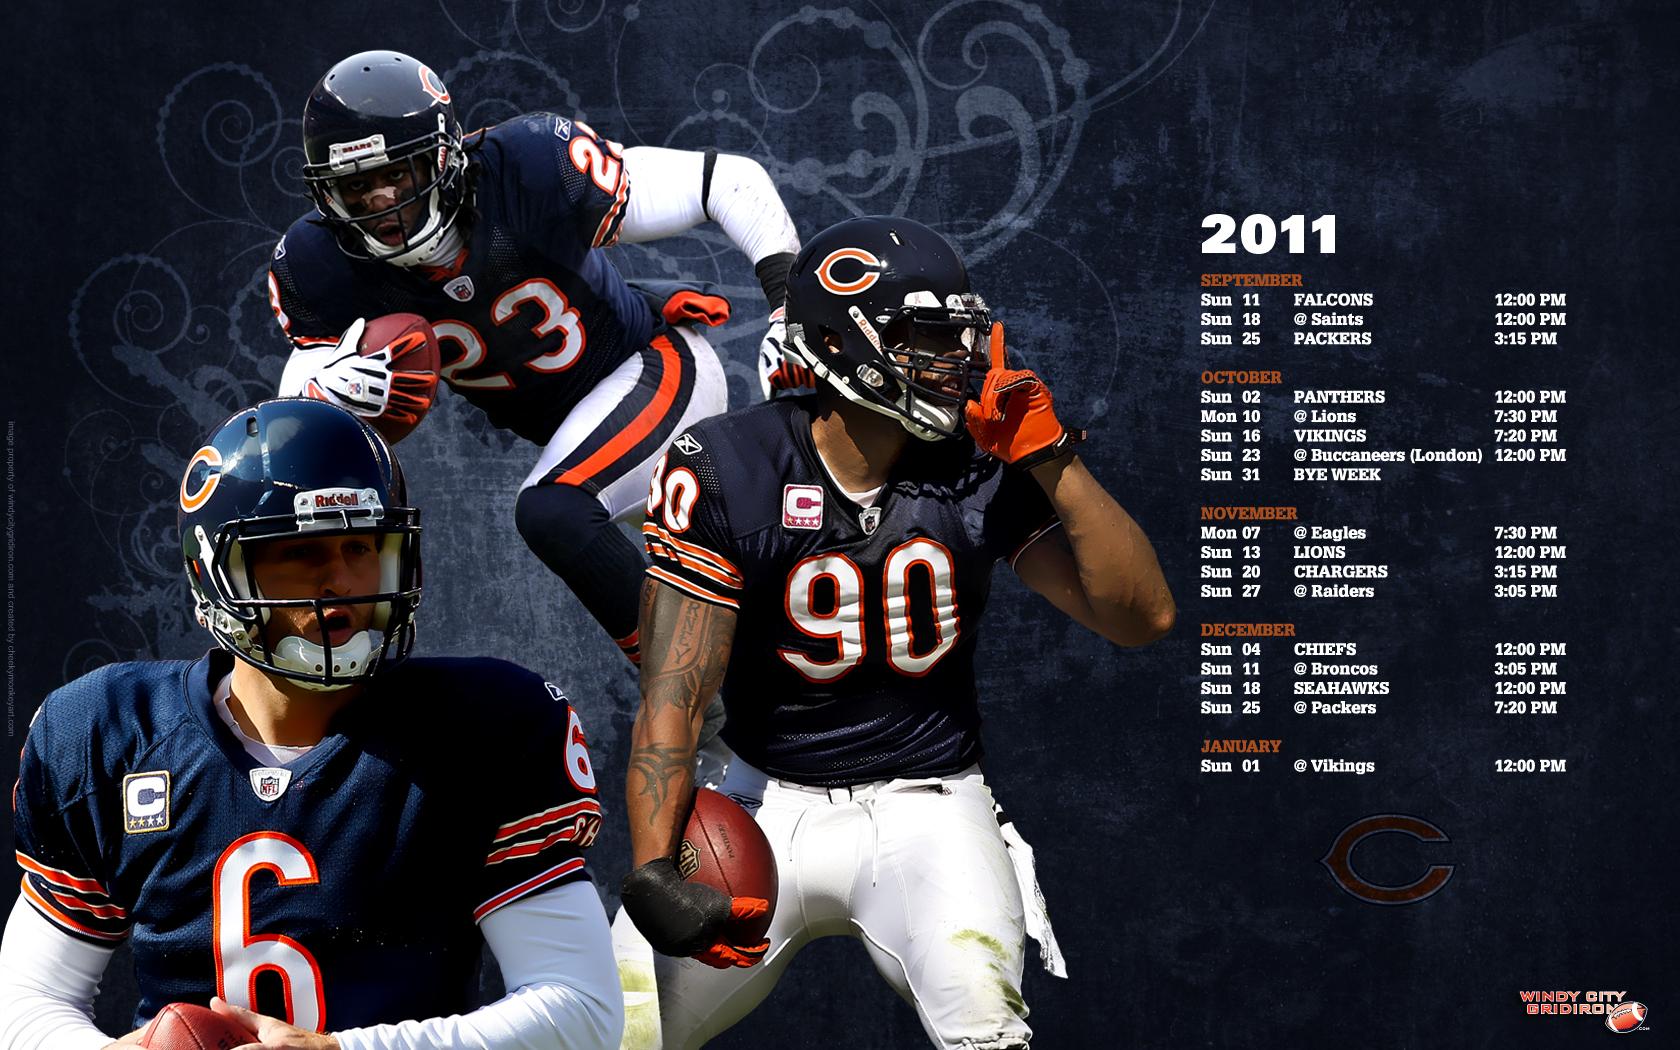 Jay Cutler Bears Wallpaper Chicago bears 2011 season 1680x1050